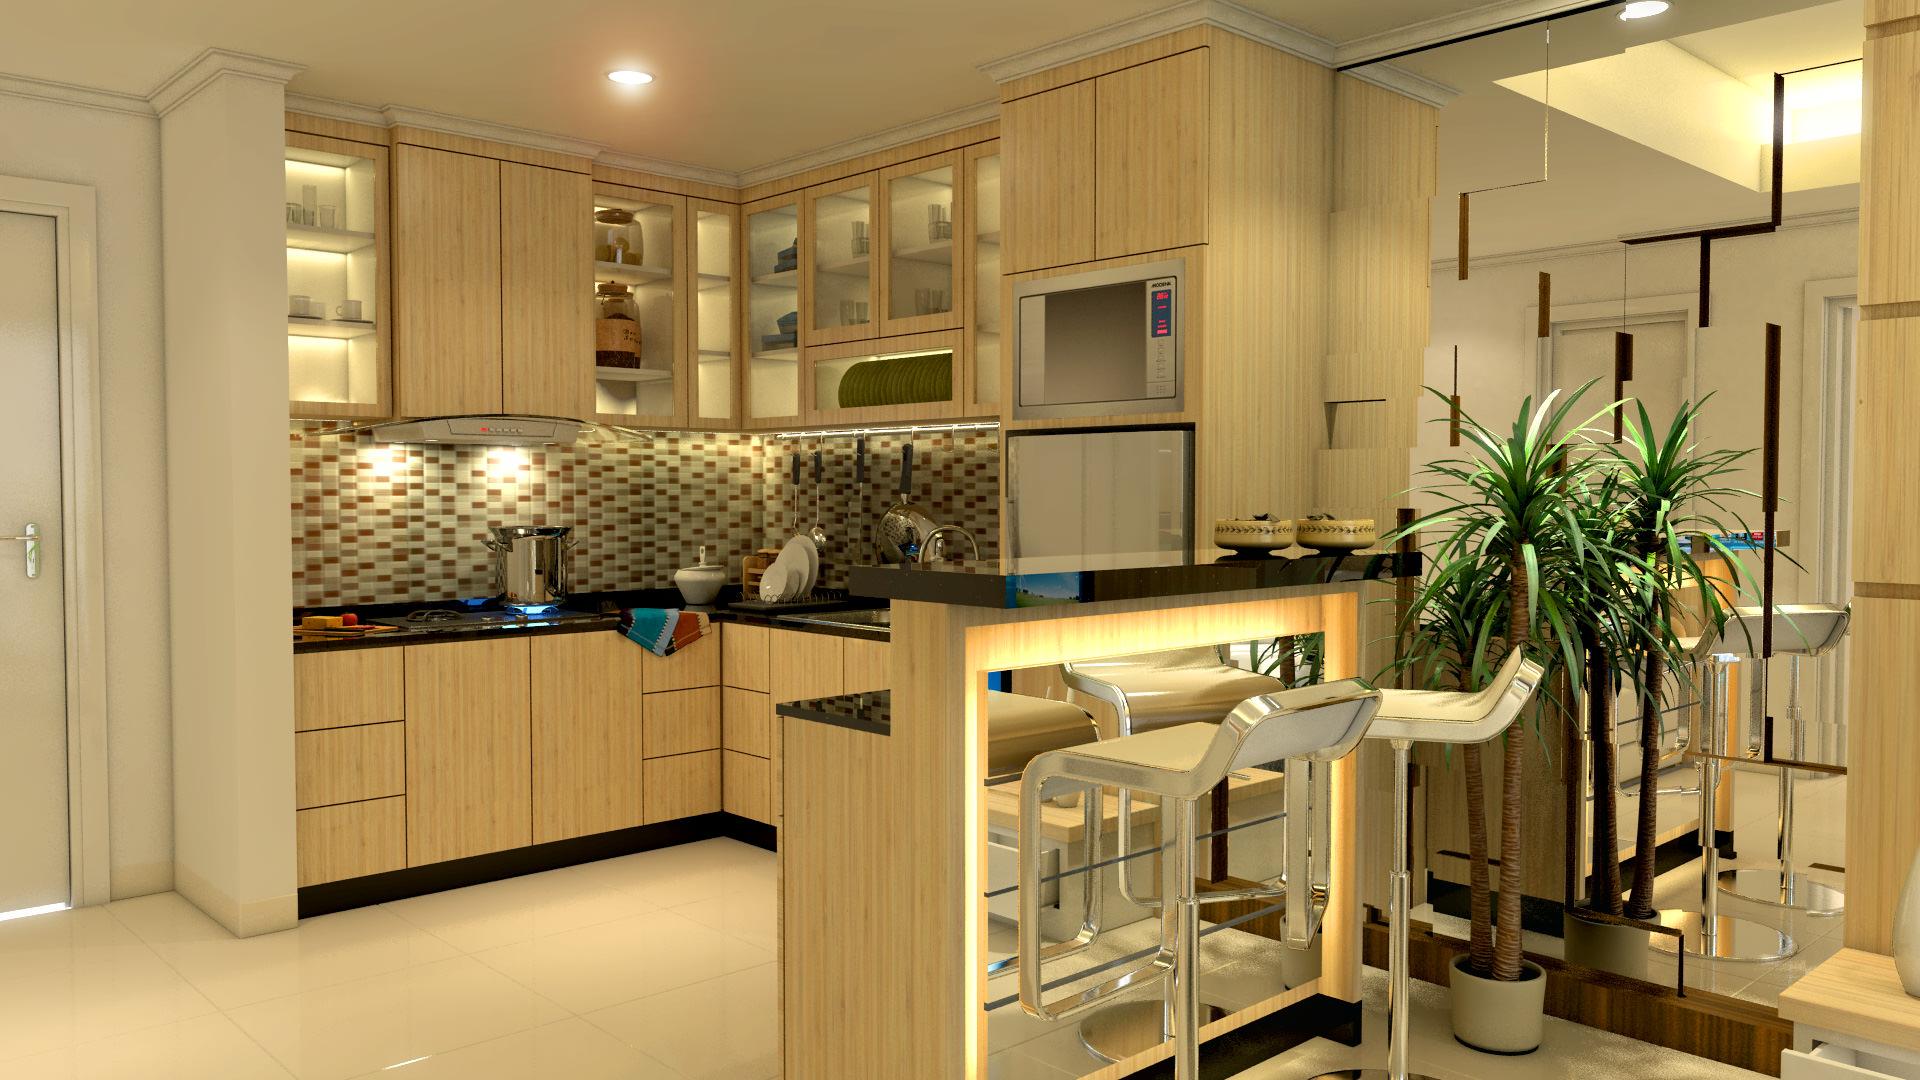 studio type apartment 3D Model .max - CGTrader.com